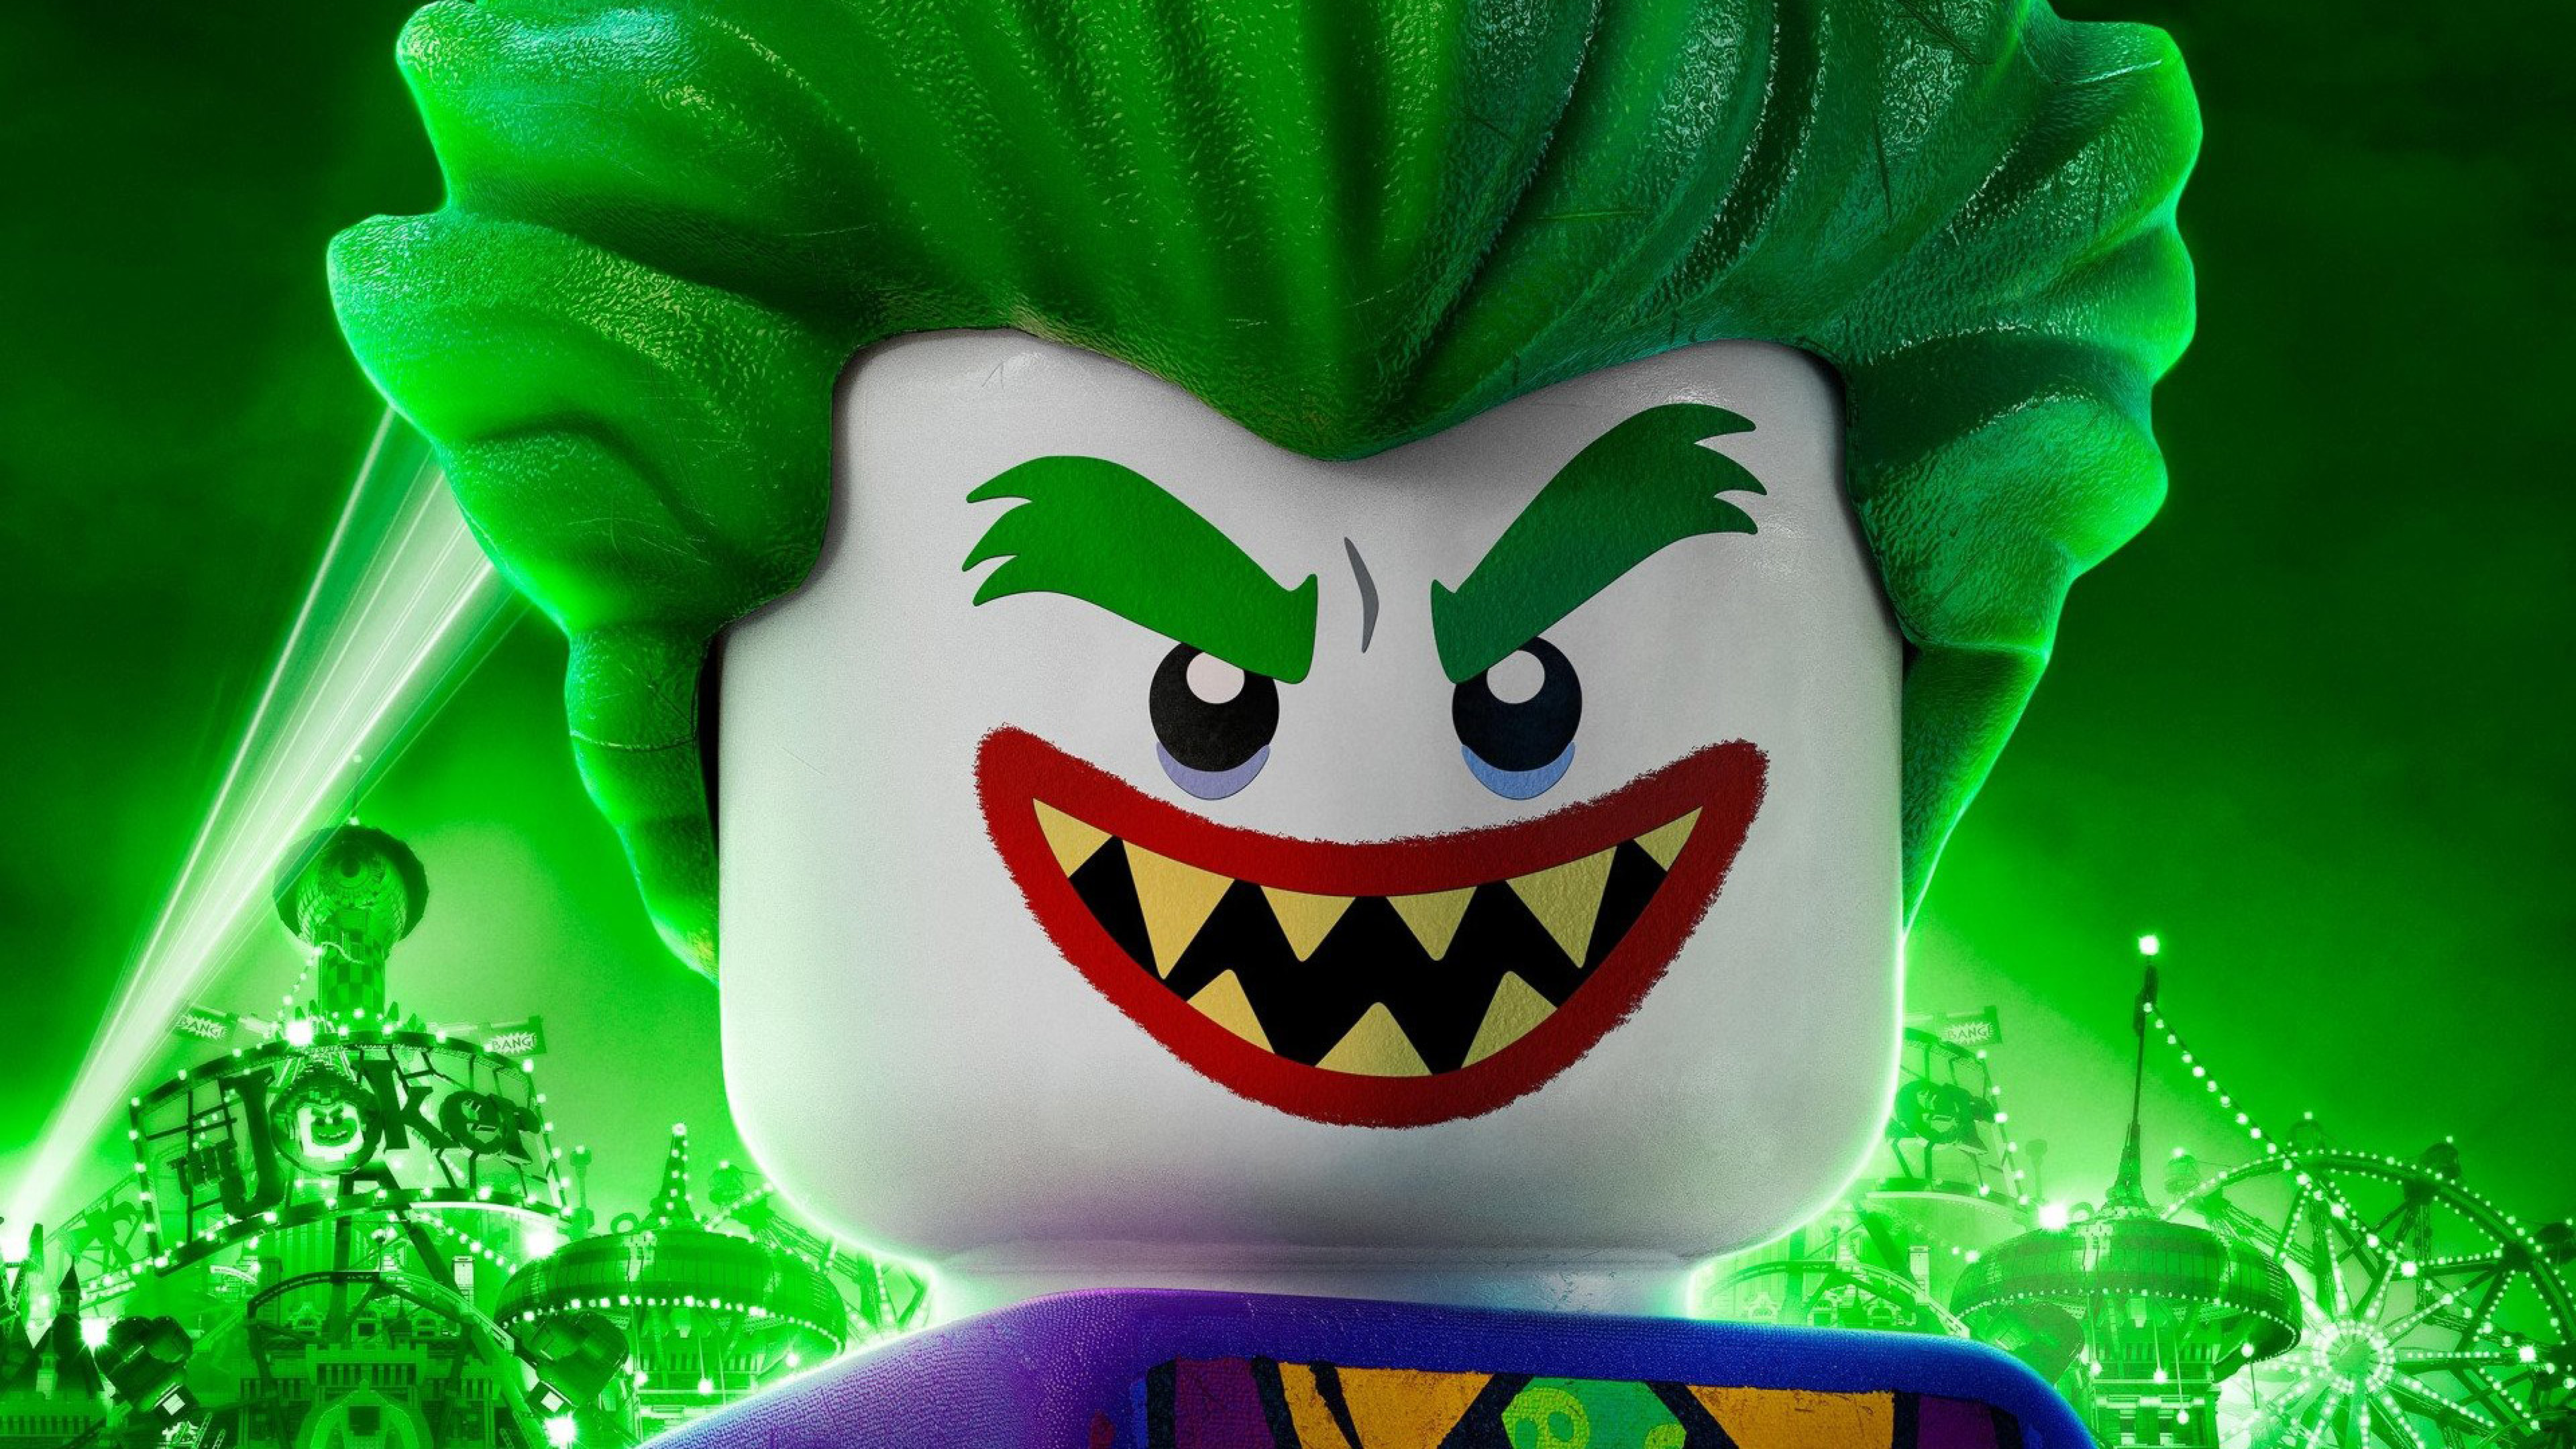 the lego batman movie hd wallpapers, 4k & 8k the lego batman movie